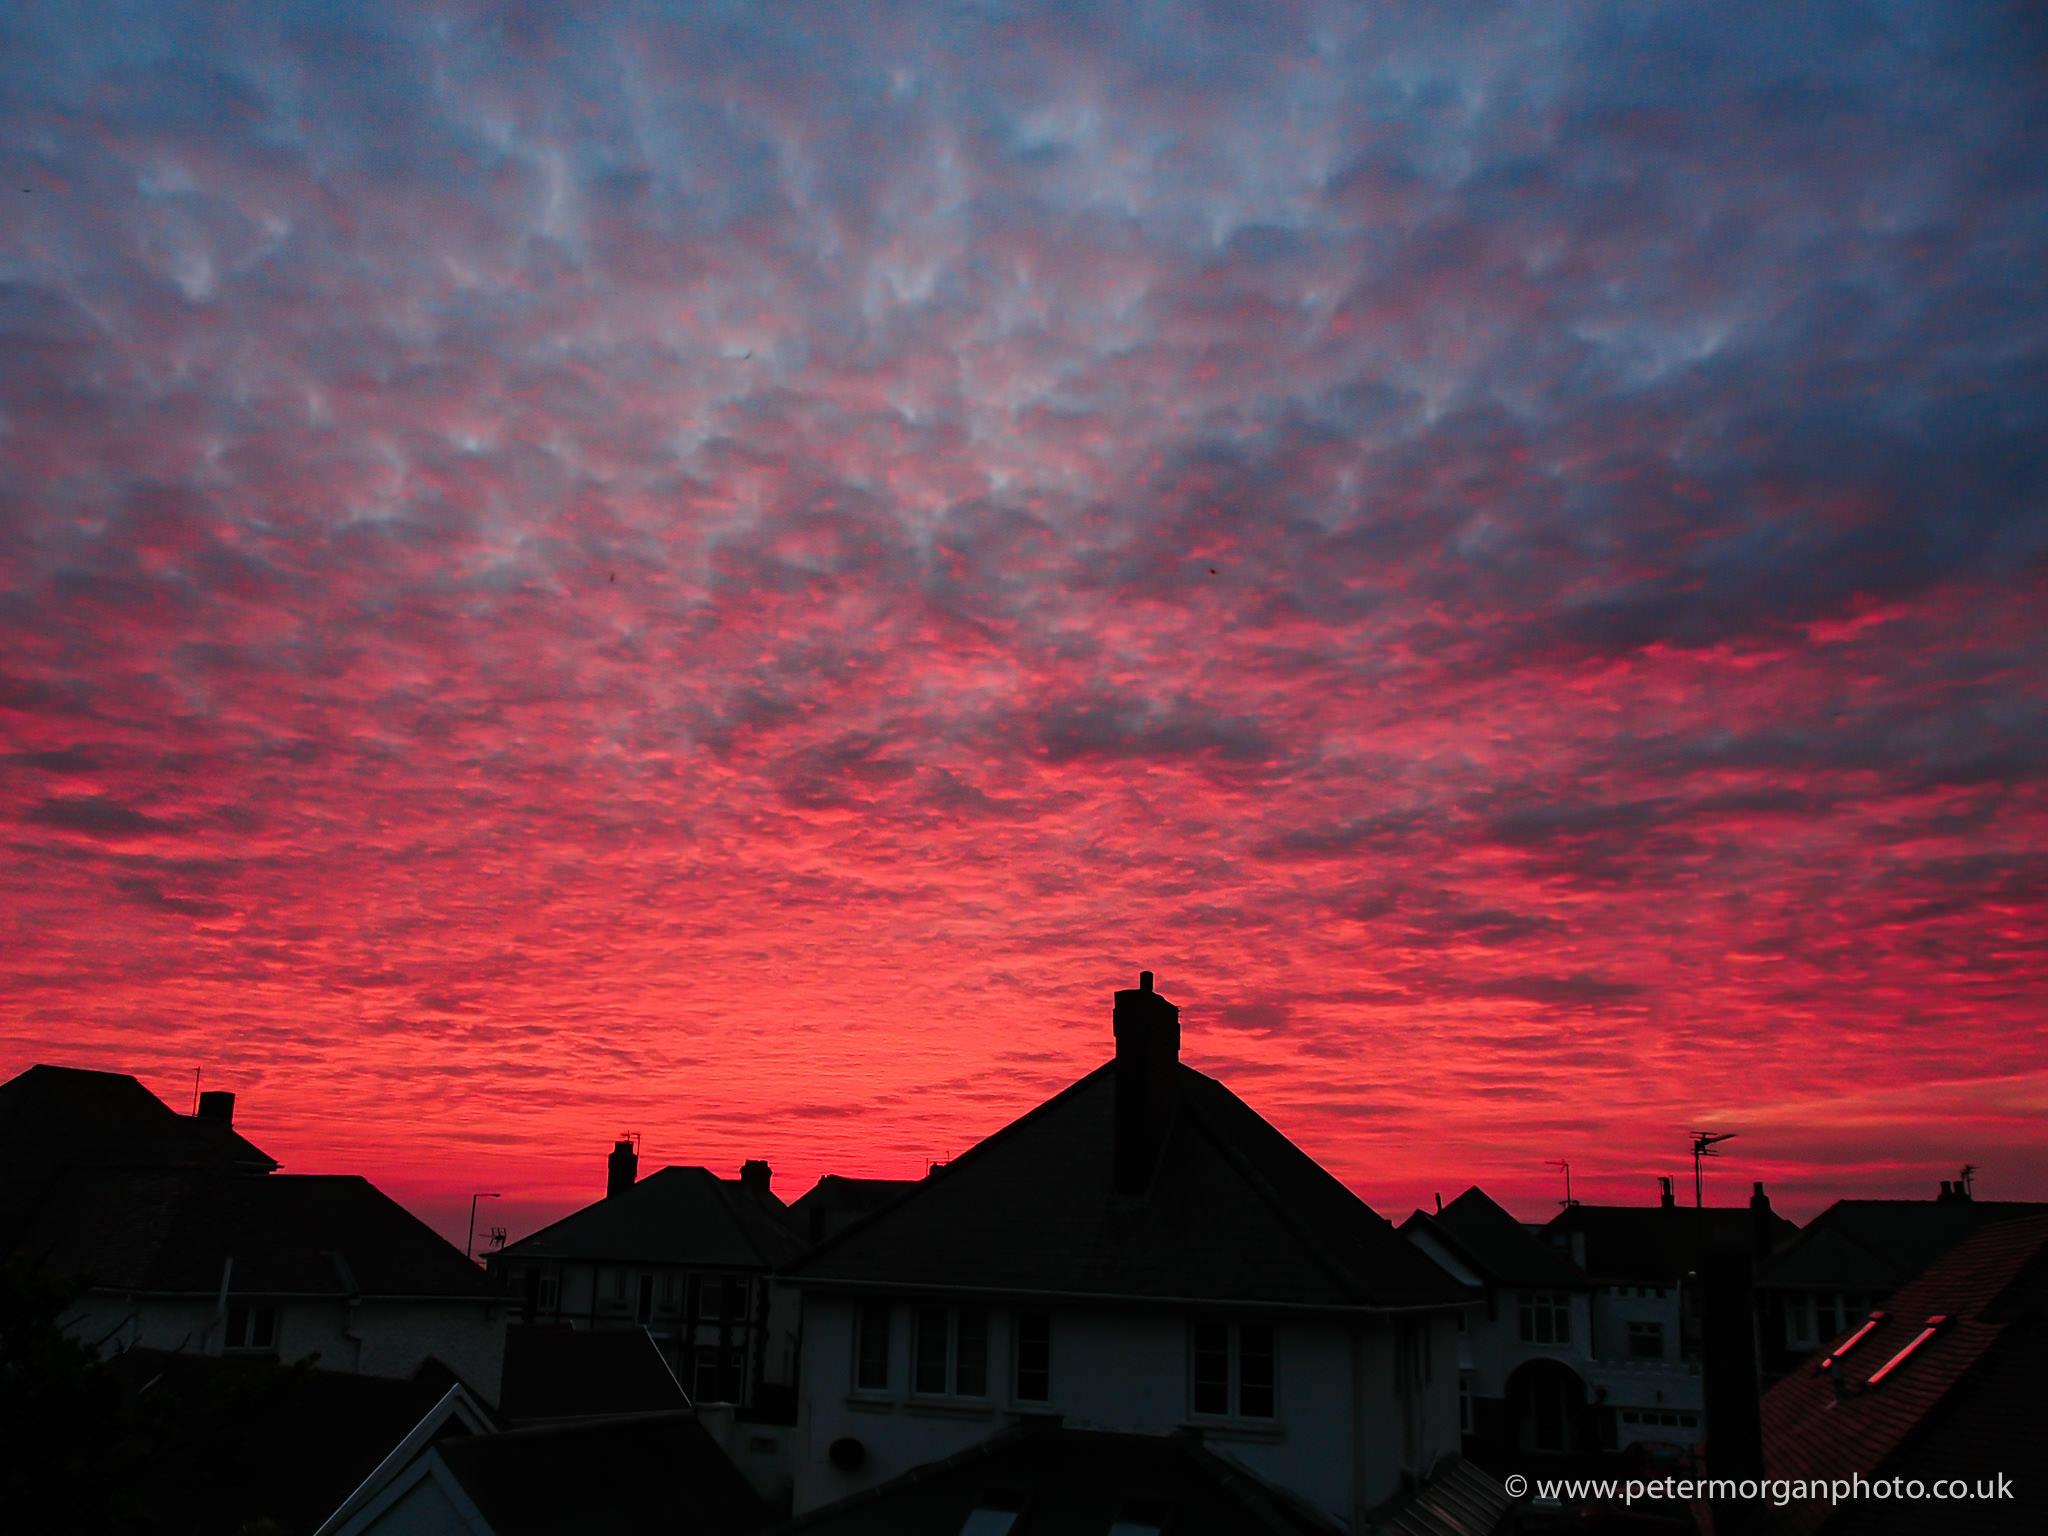 Sunset suburbia 20151011_006.jpg